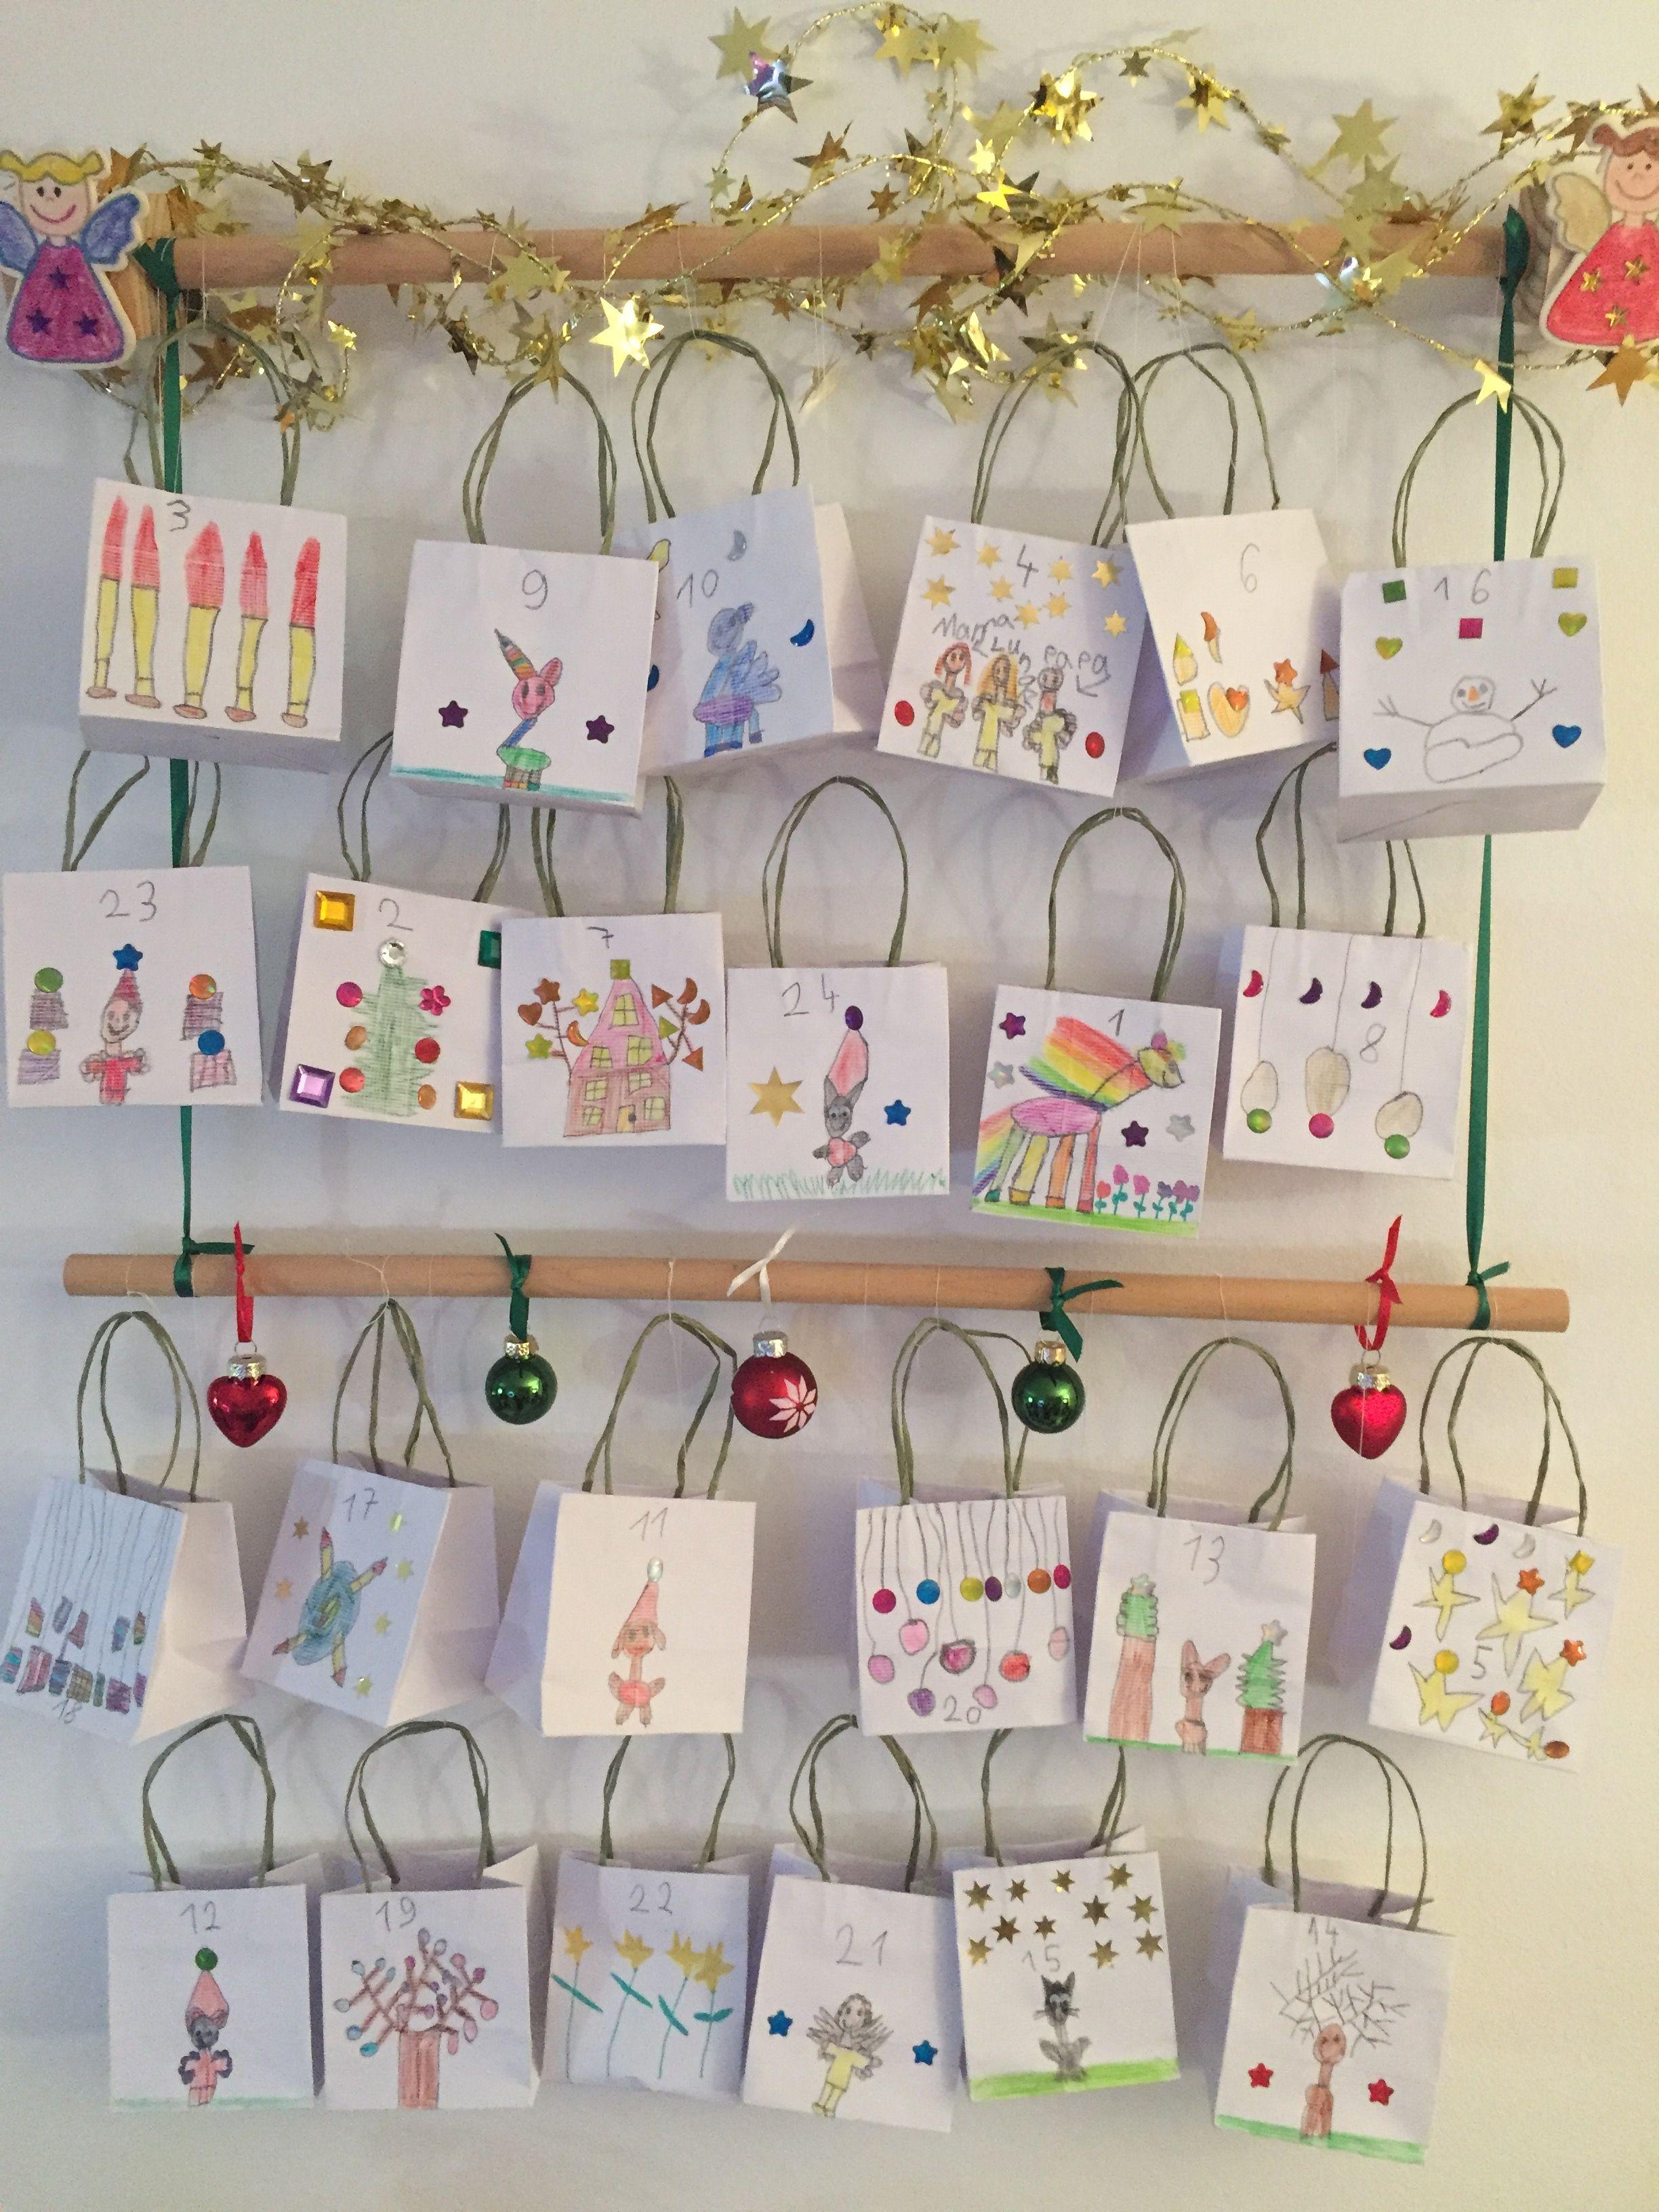 Adventskalender DIY Kinder 24 bemalte Tüten Kerst